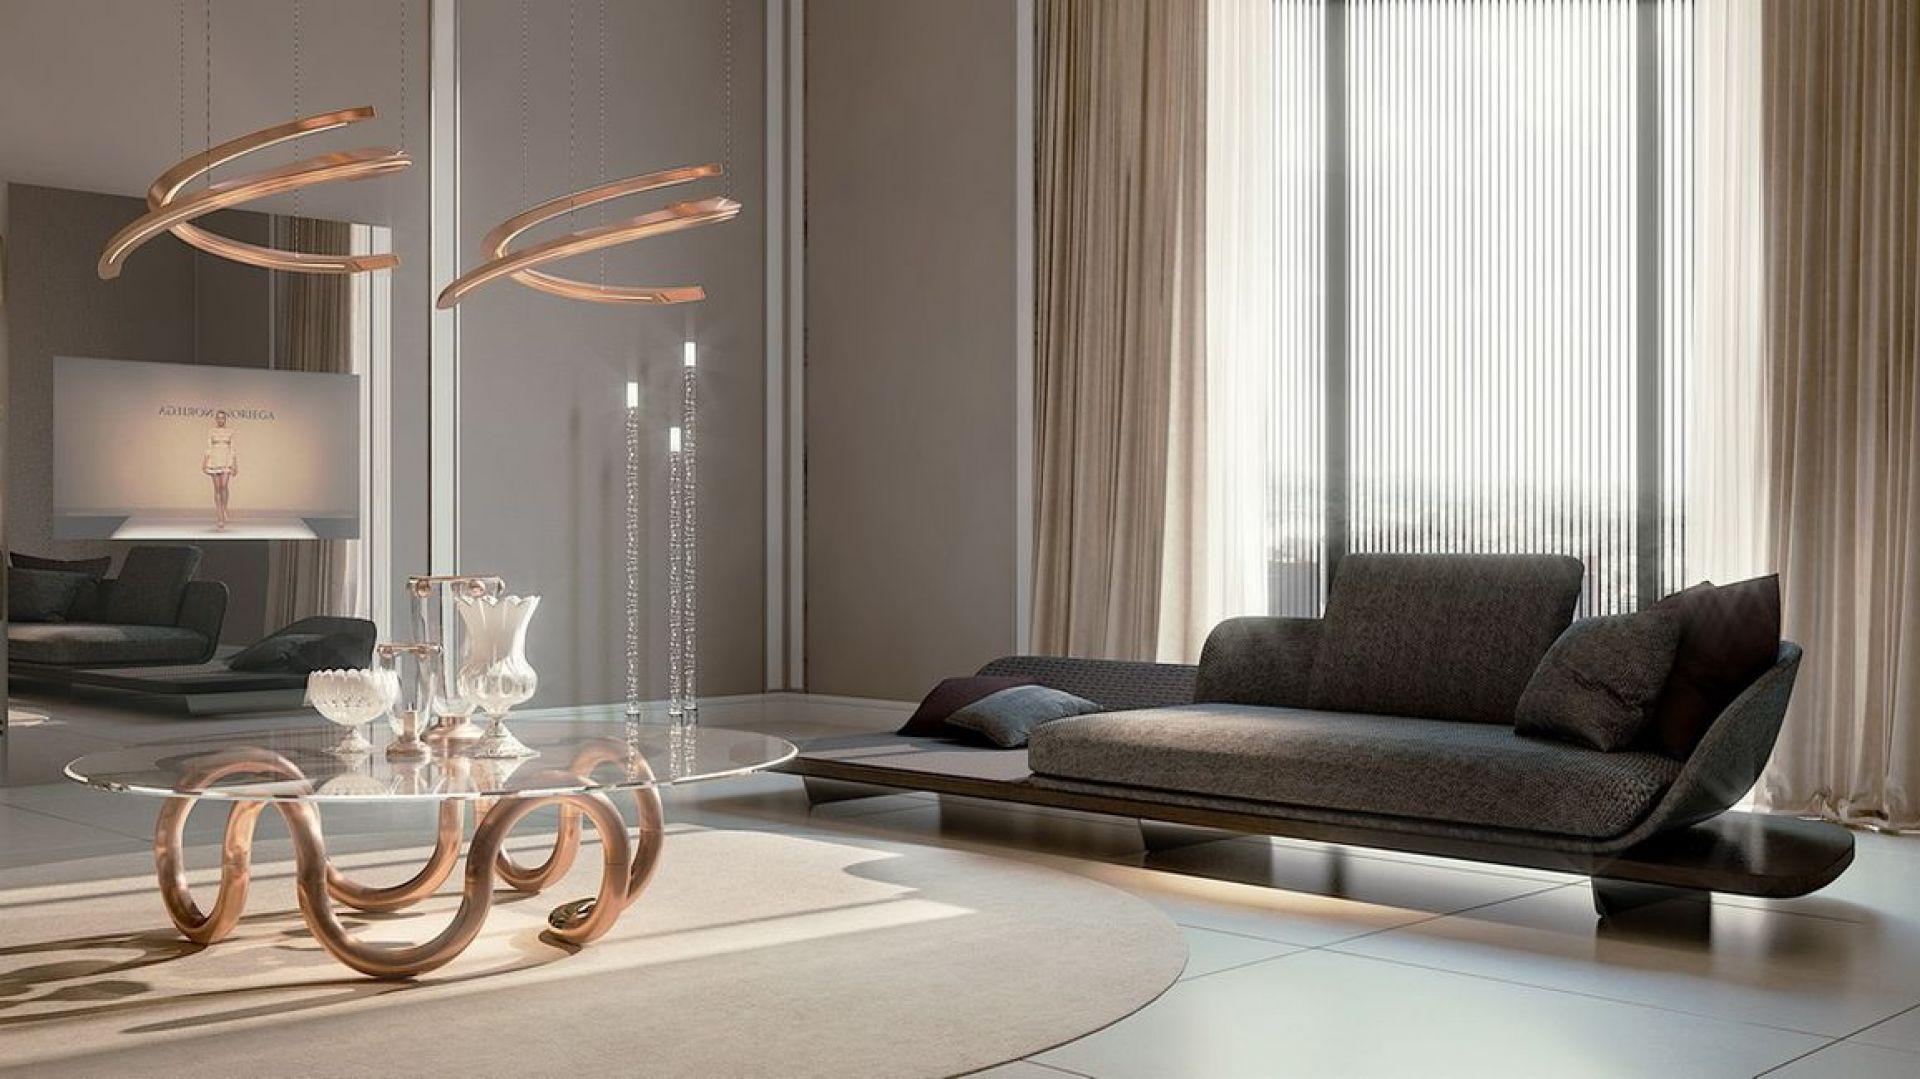 Sofa, stół oraz lampa z najnowszej kolekcji Pininfarina Segno marki Reflex. Fot. Galeria Mebli Heban